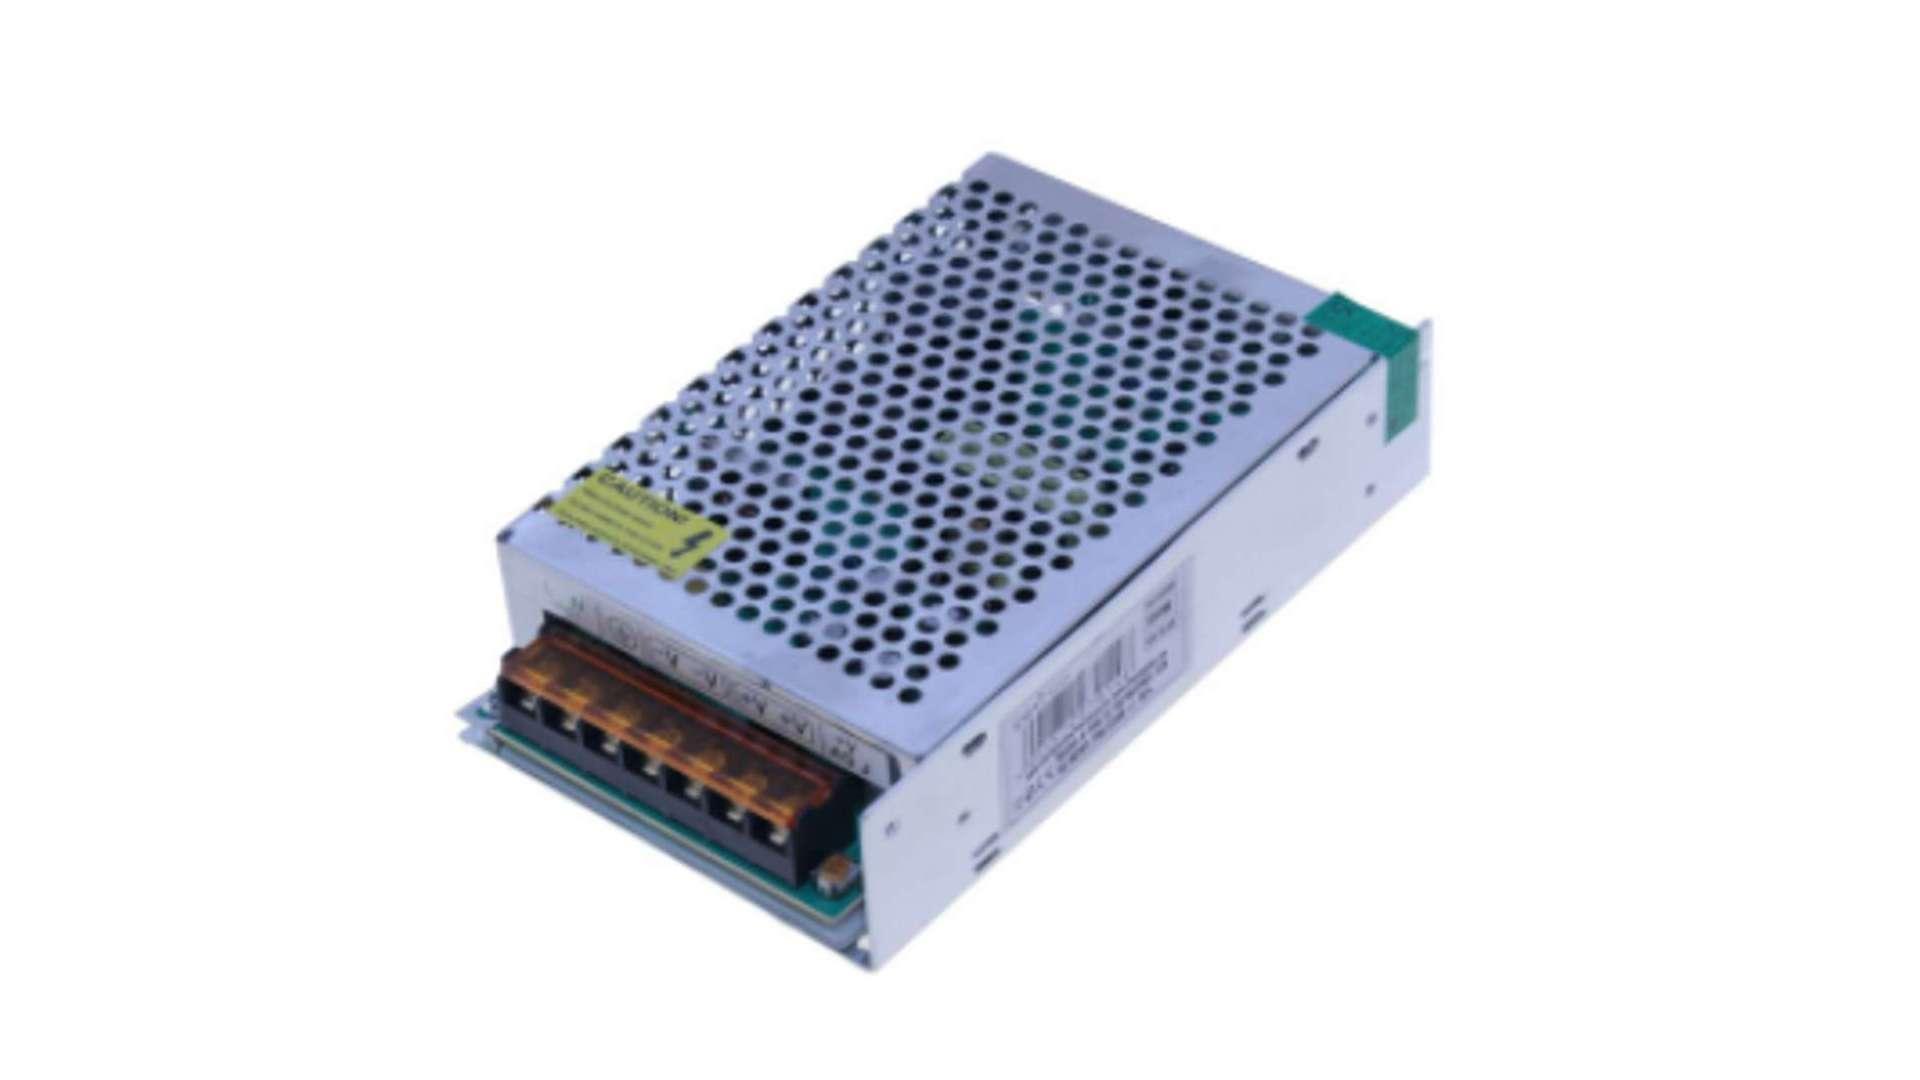 12V 150W IP20 enclosed power supply